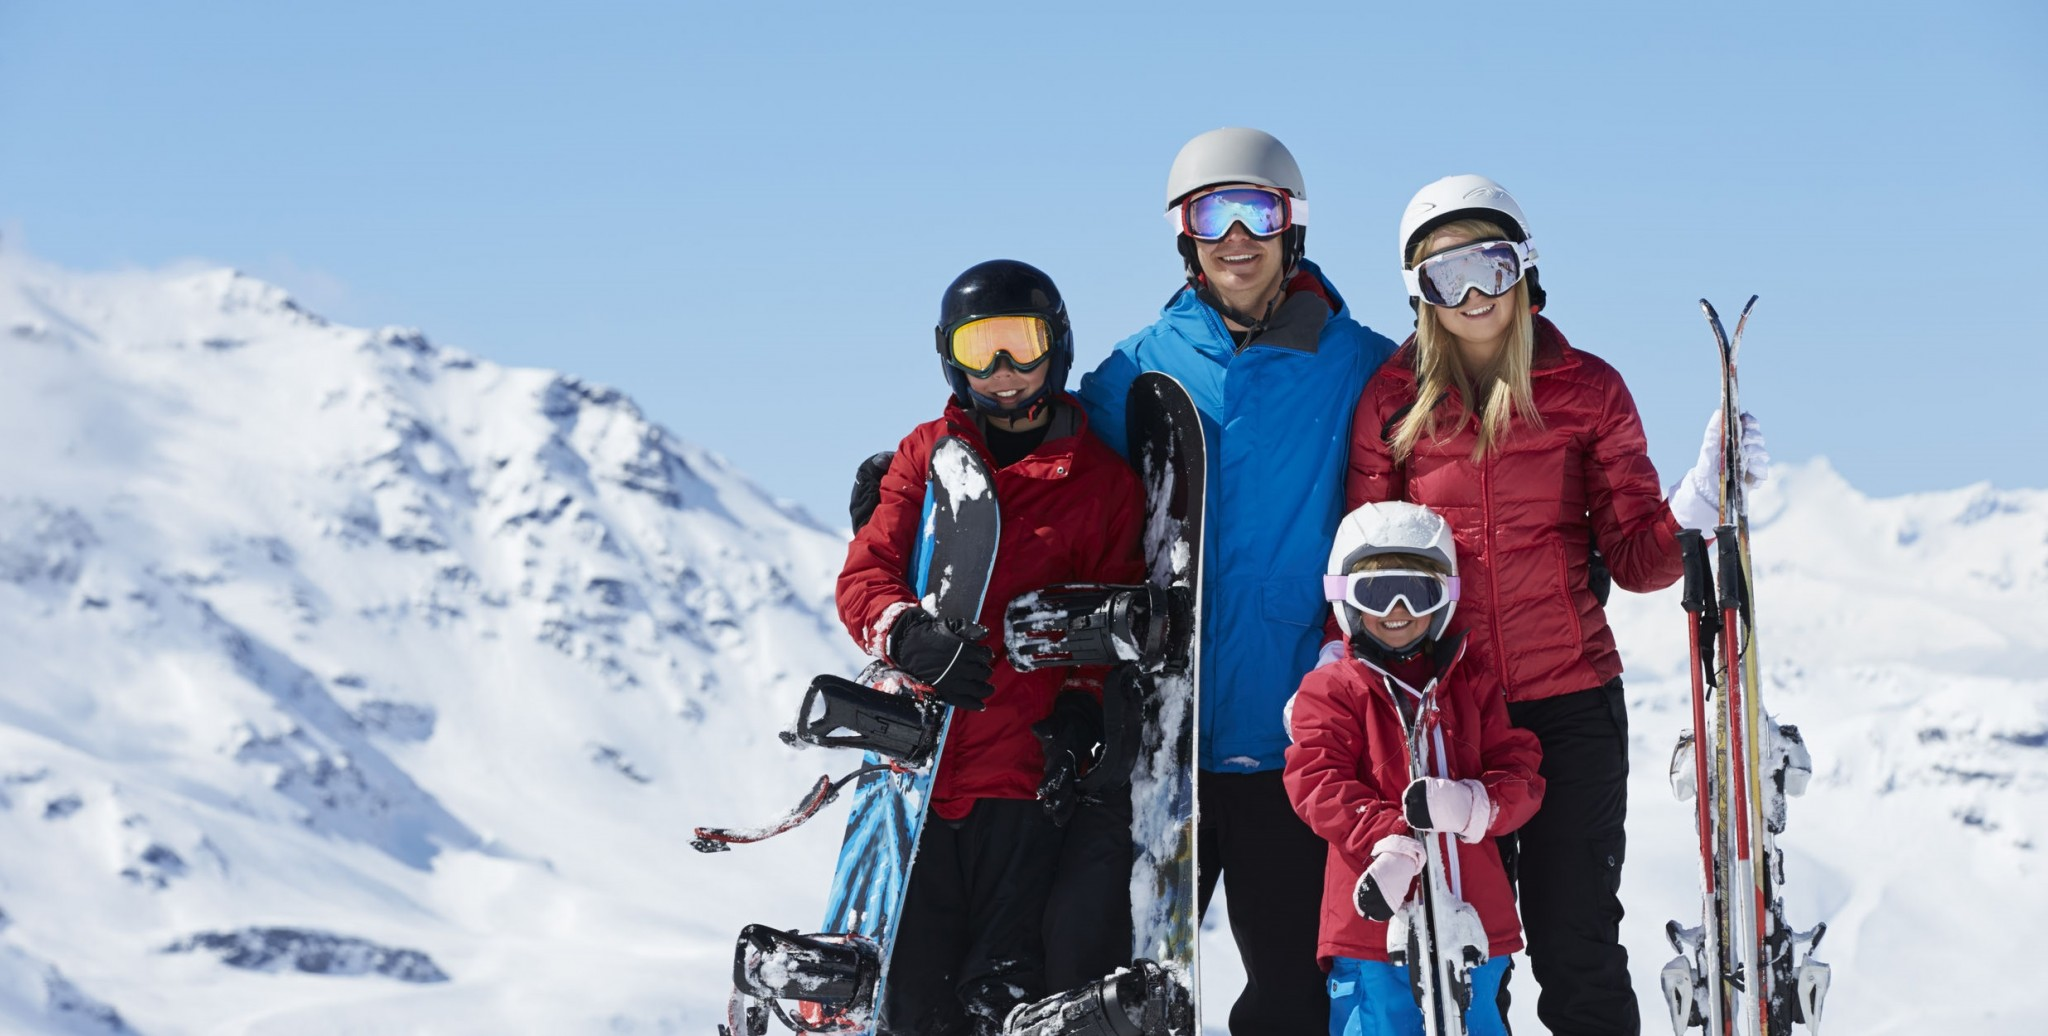 Familia gafas de esquí